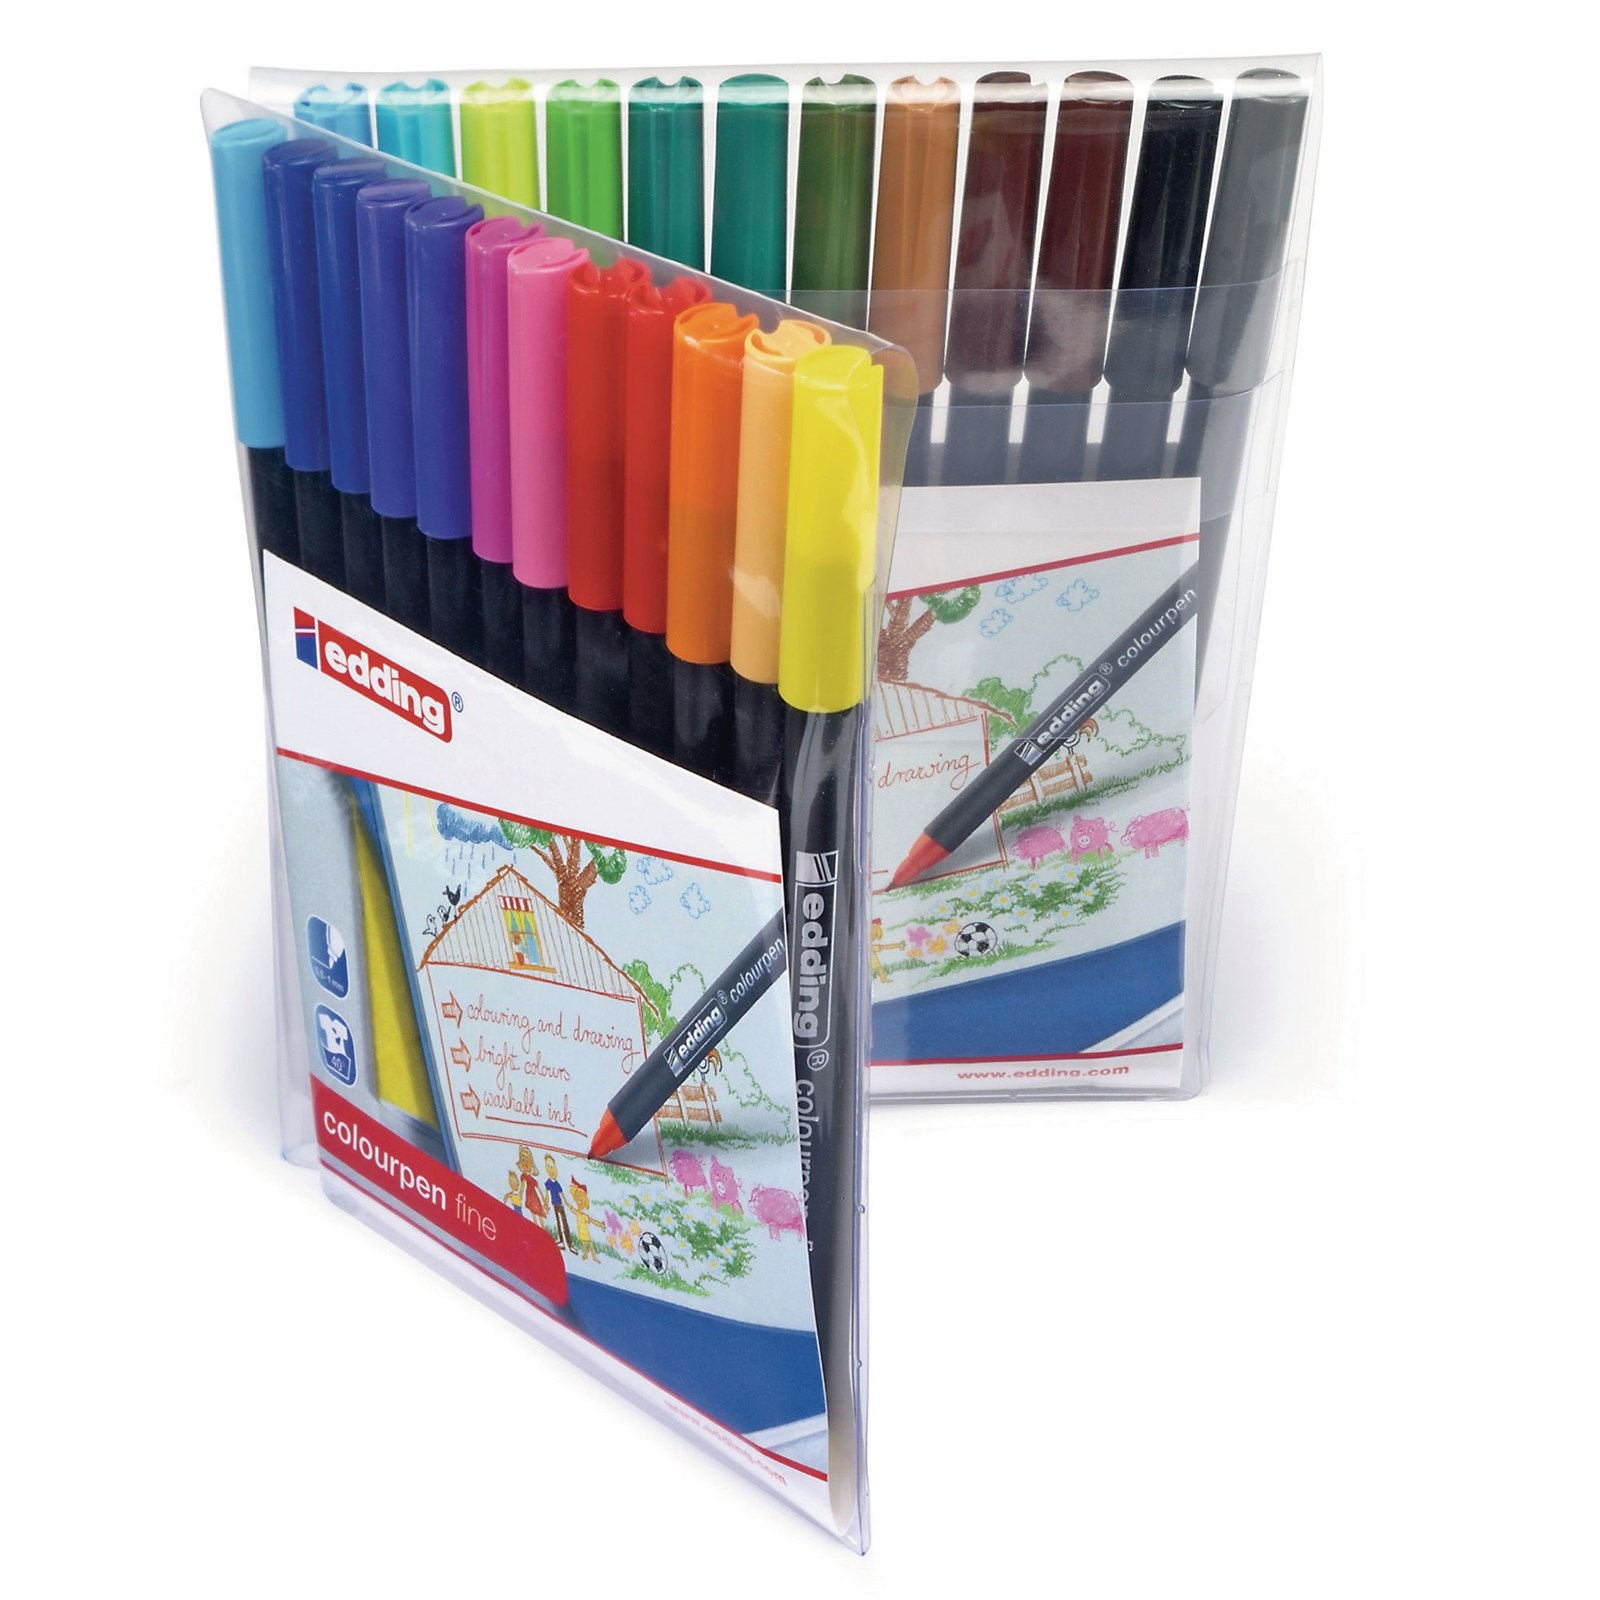 Berol Colour Brush Pens | Homecrafts